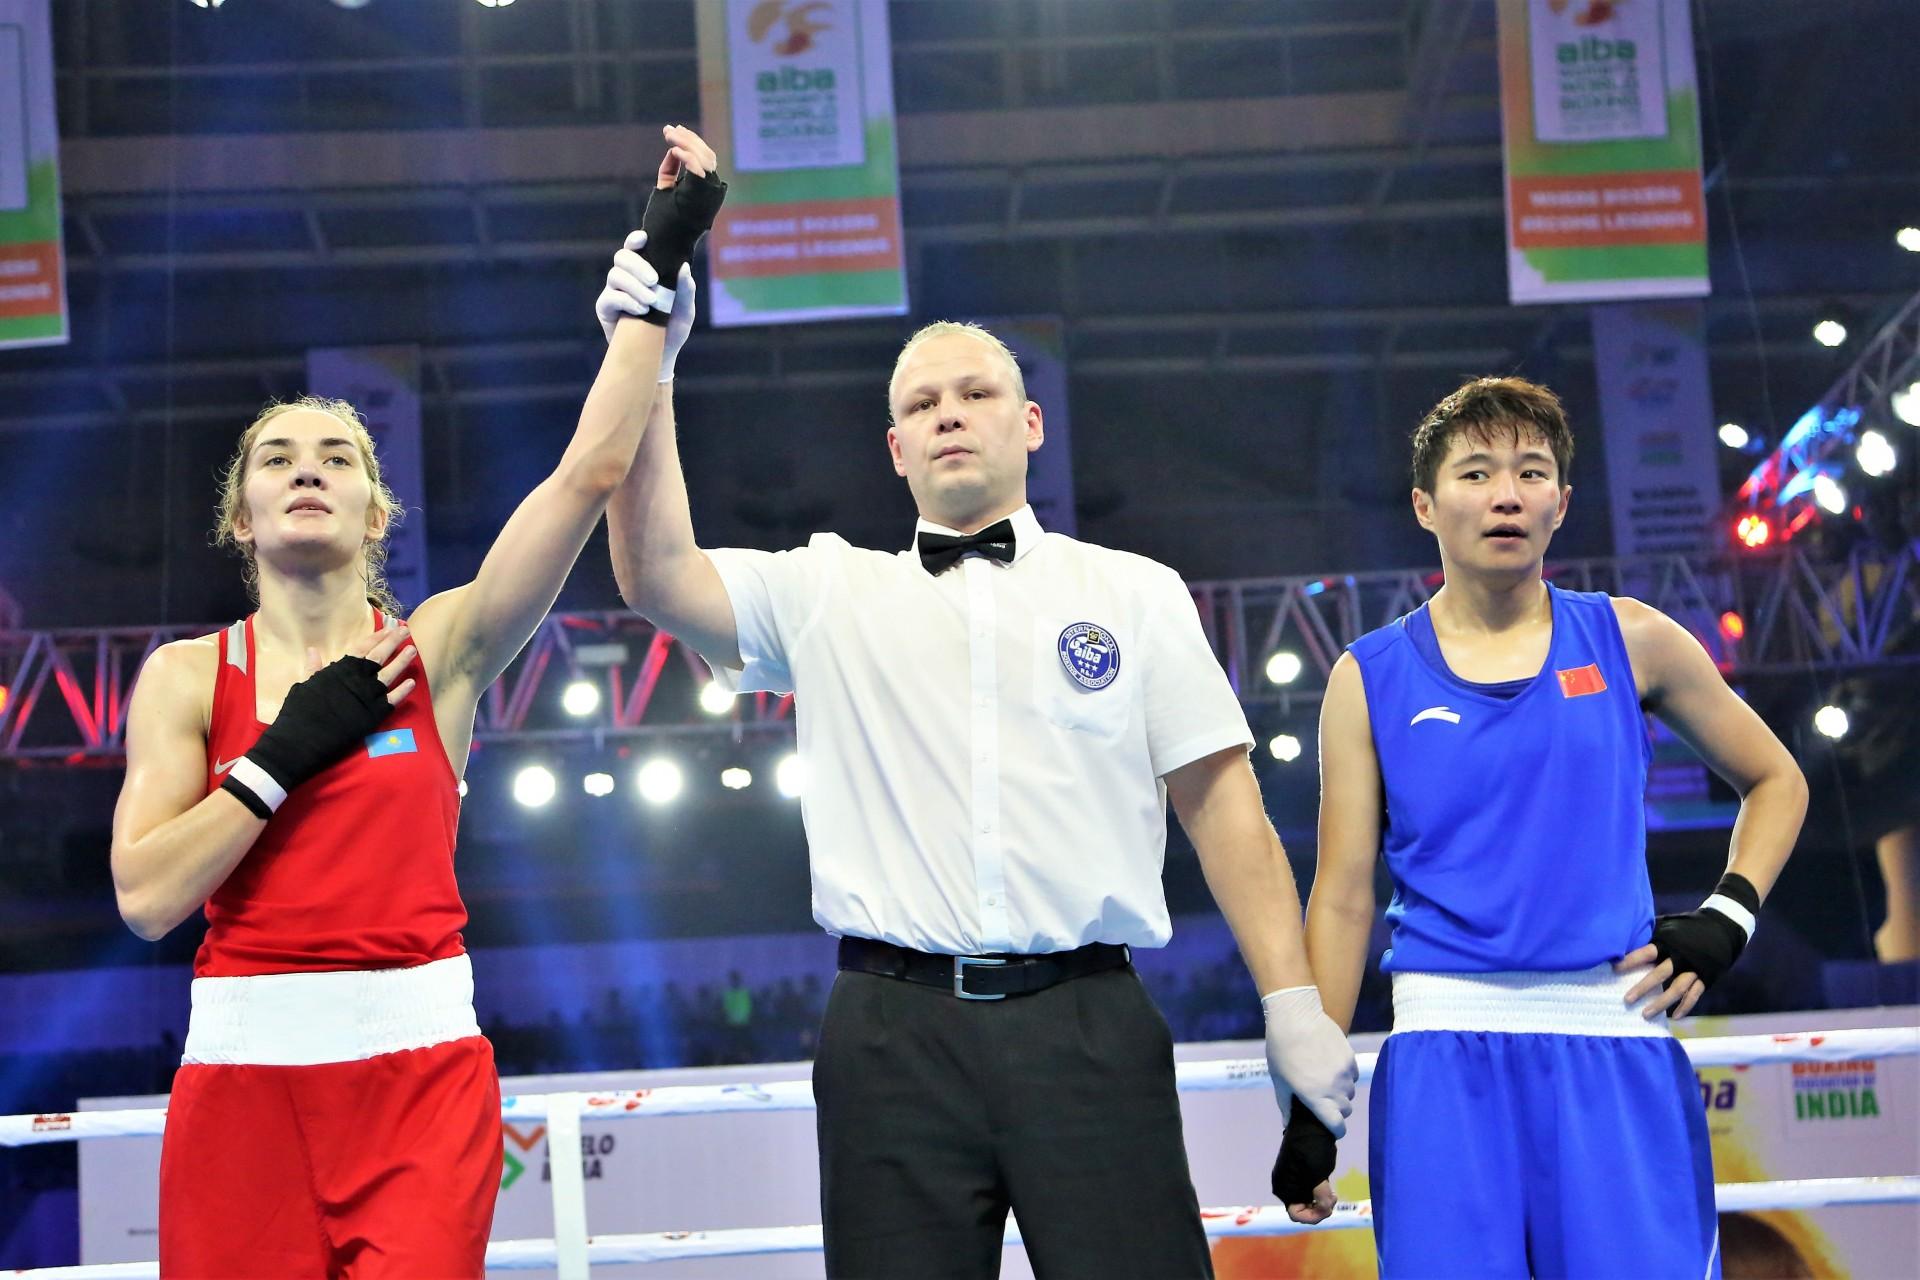 Карина Ибрагимова завоевала бронзу на чемпионате мира по боксу